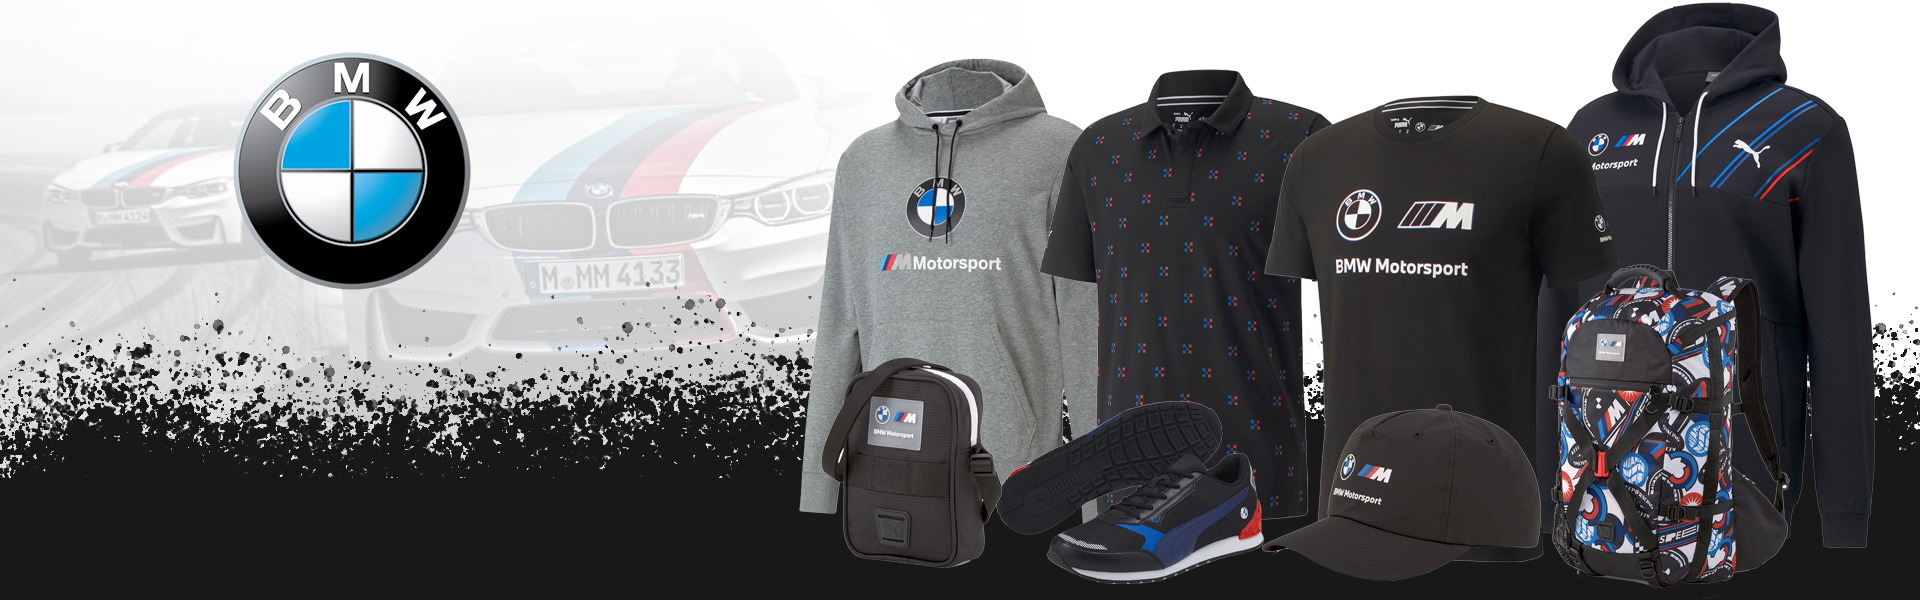 BMW Motorsport products